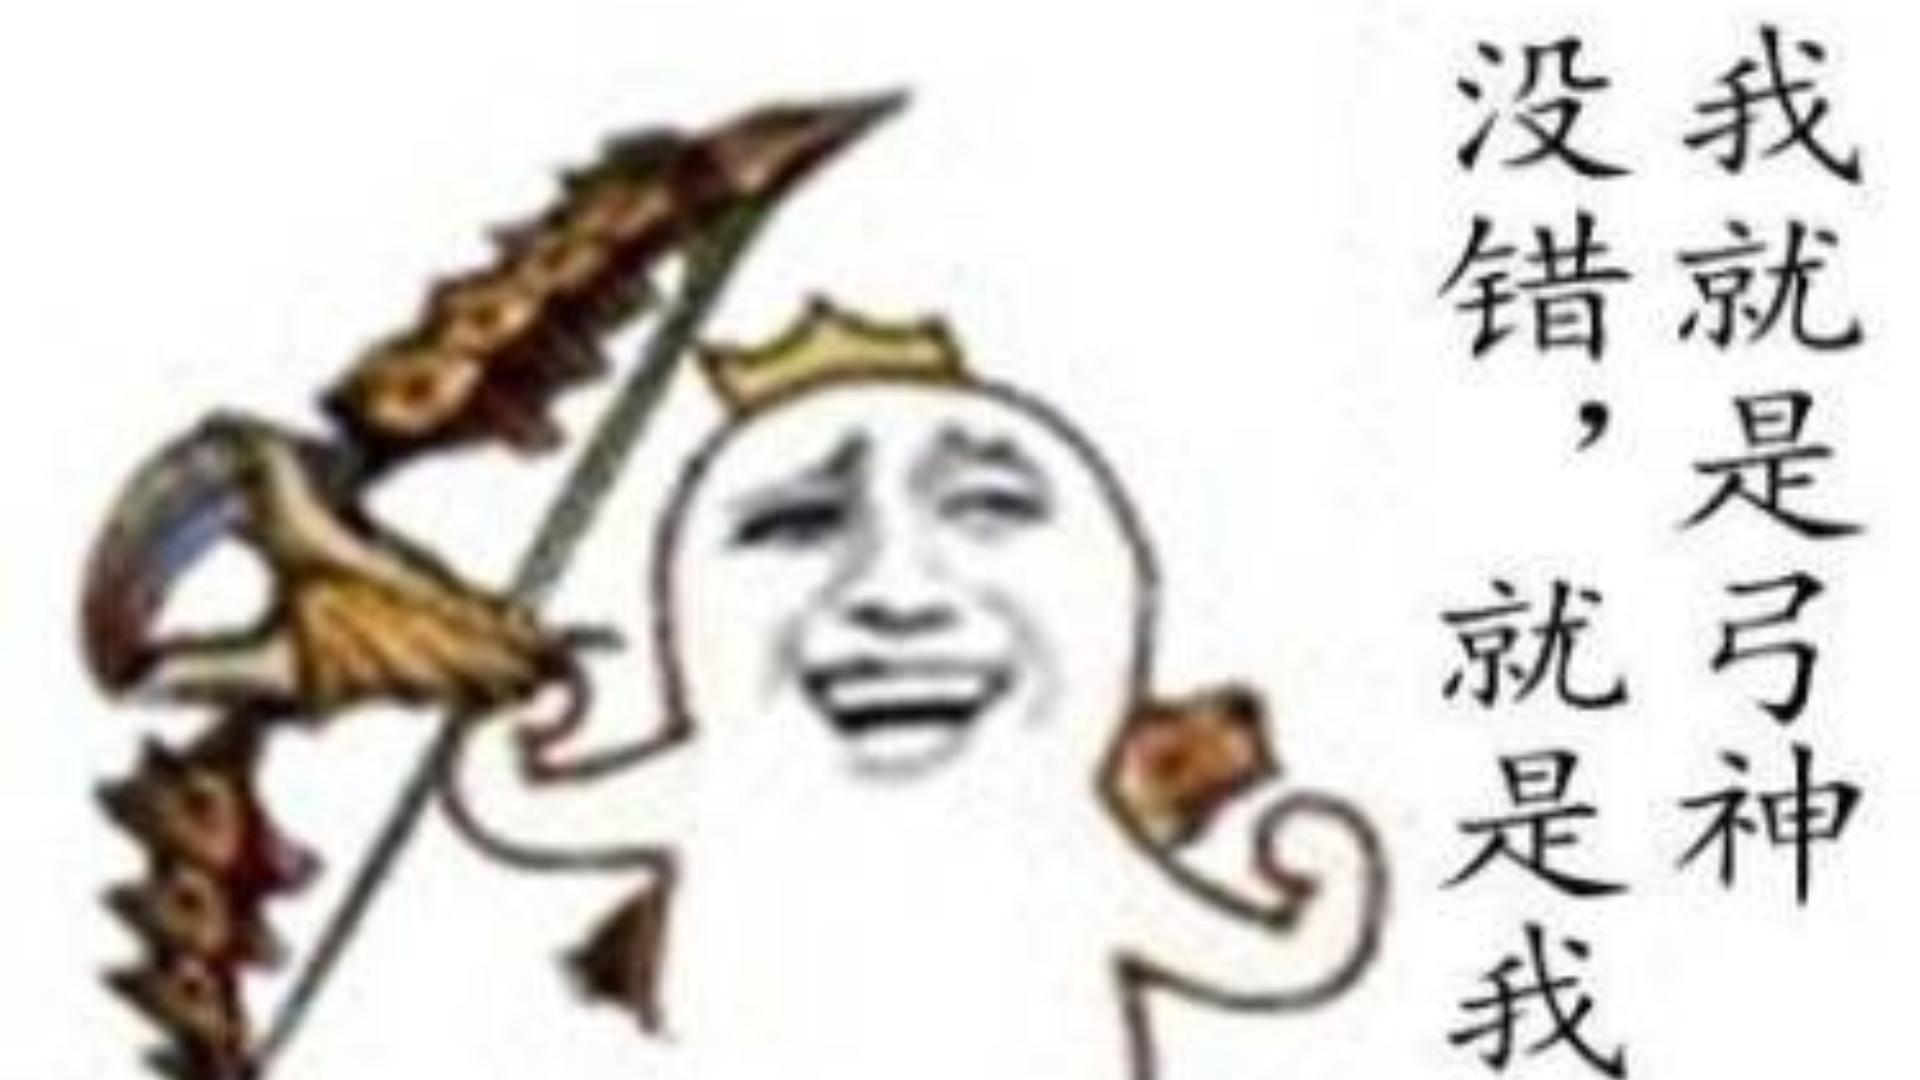 【MHW肥肥猎团】废物弓箭PK雷娘 在线挨电 9.31